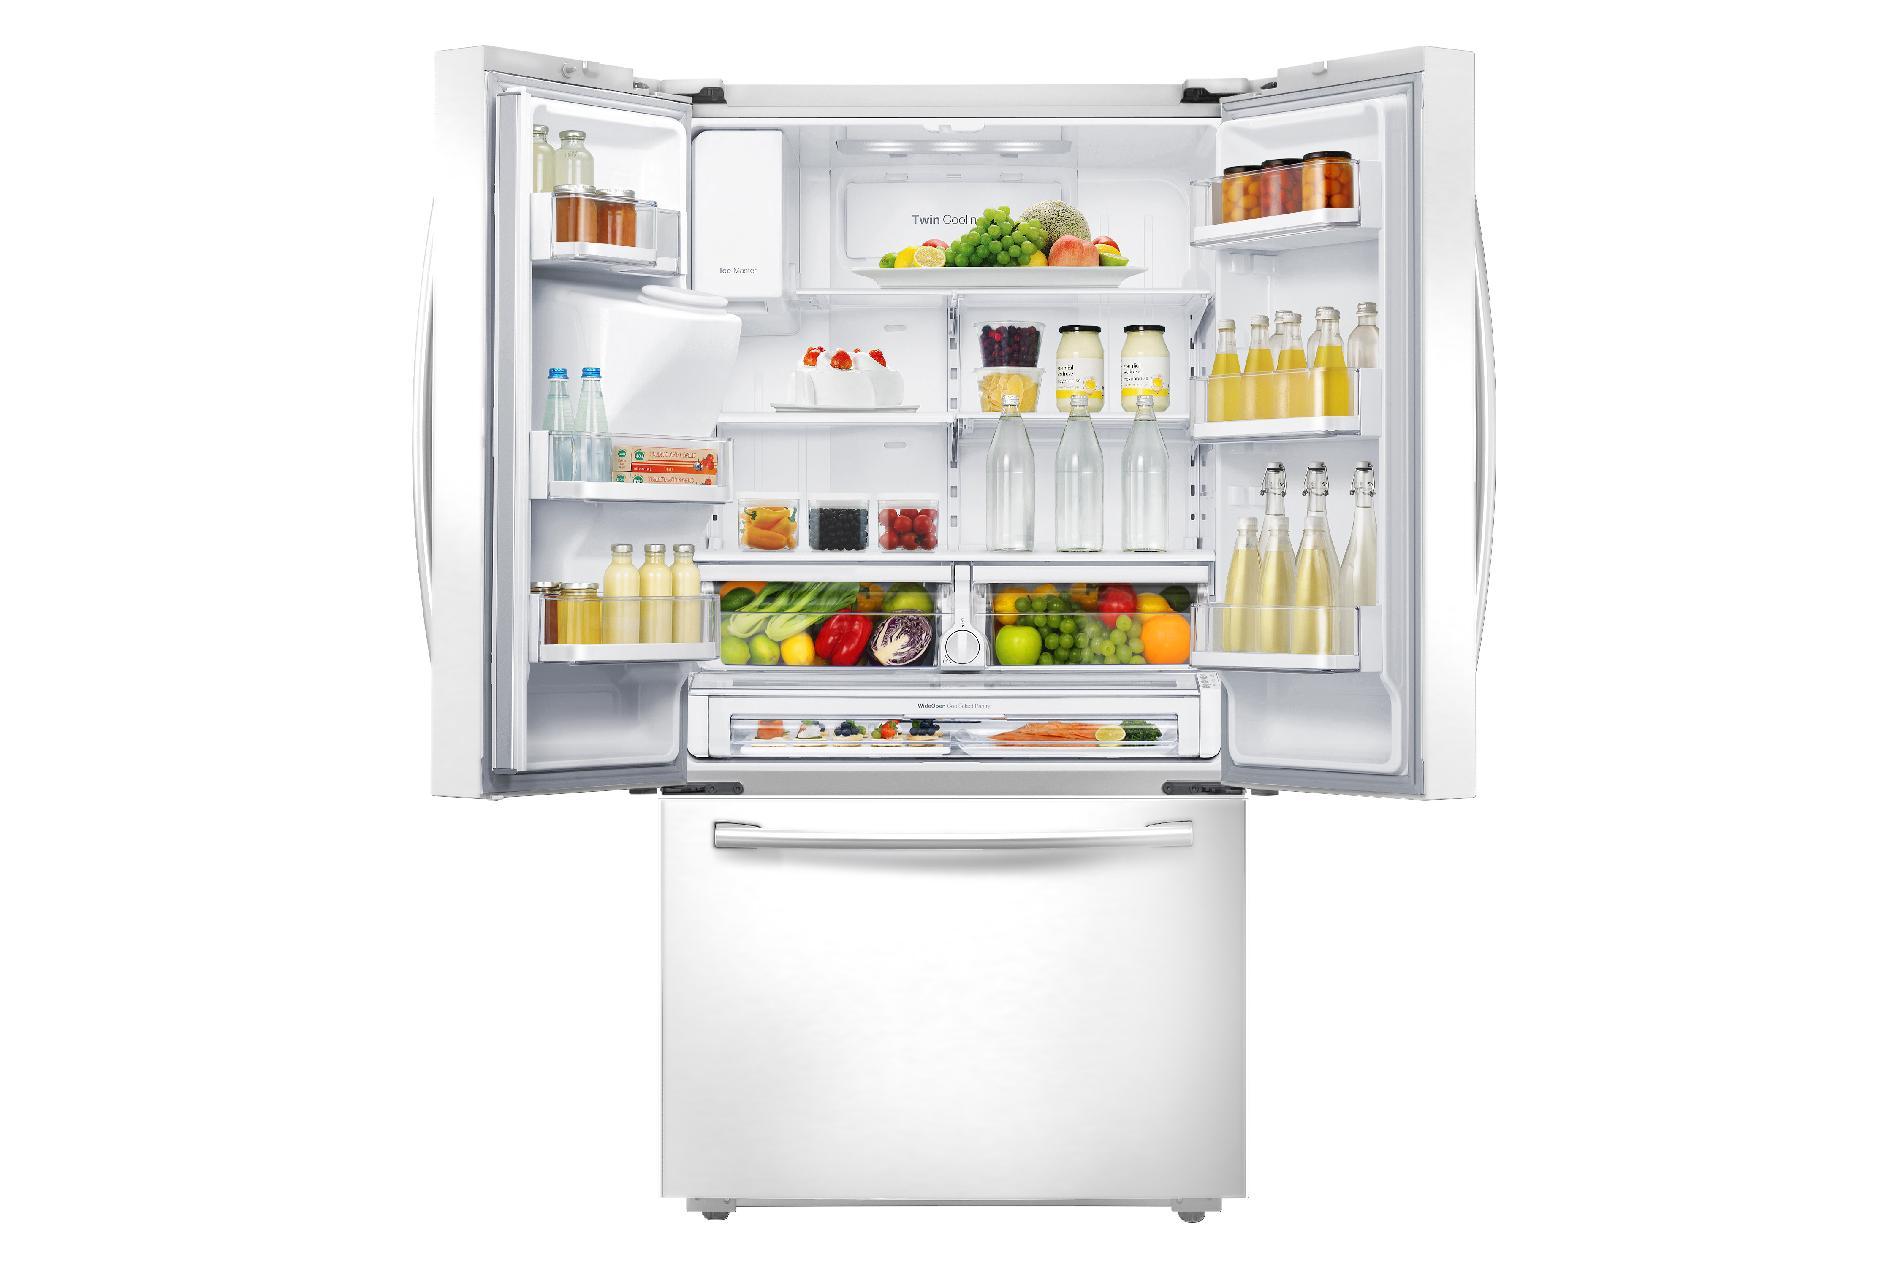 Samsung 22.5 cu. ft. Counter-Depth French Door Refrigerator - White